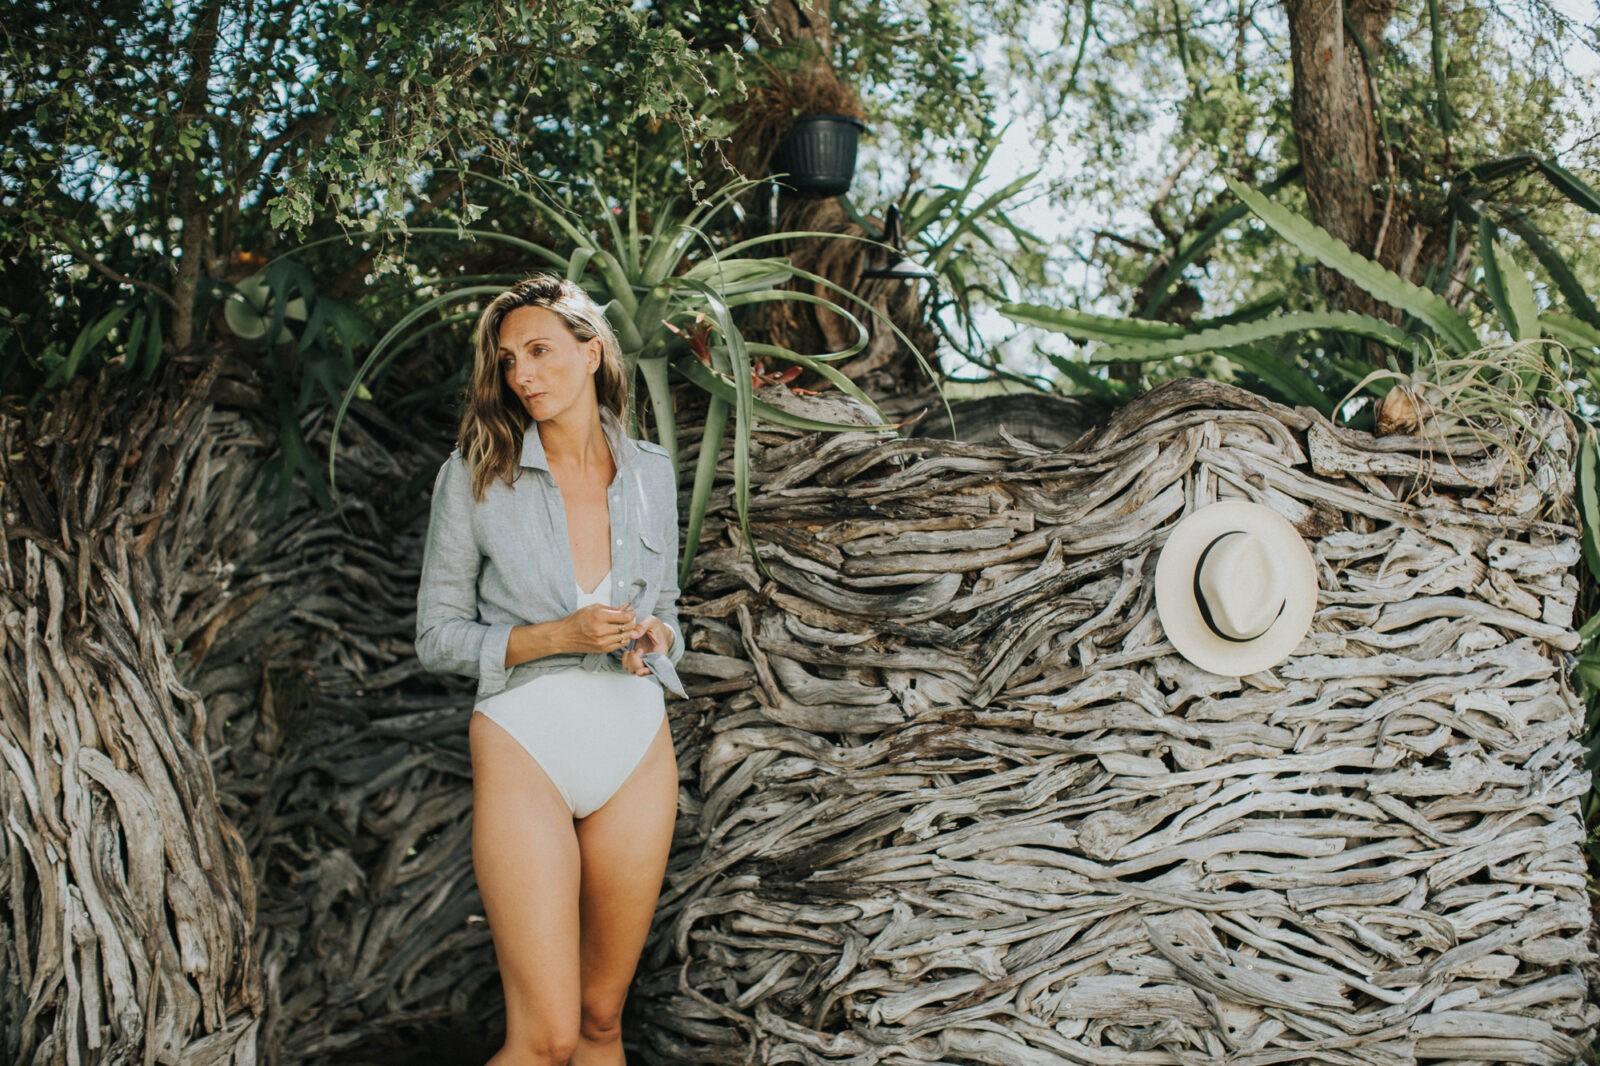 driftwood outdoor shower eleuthera bahamas